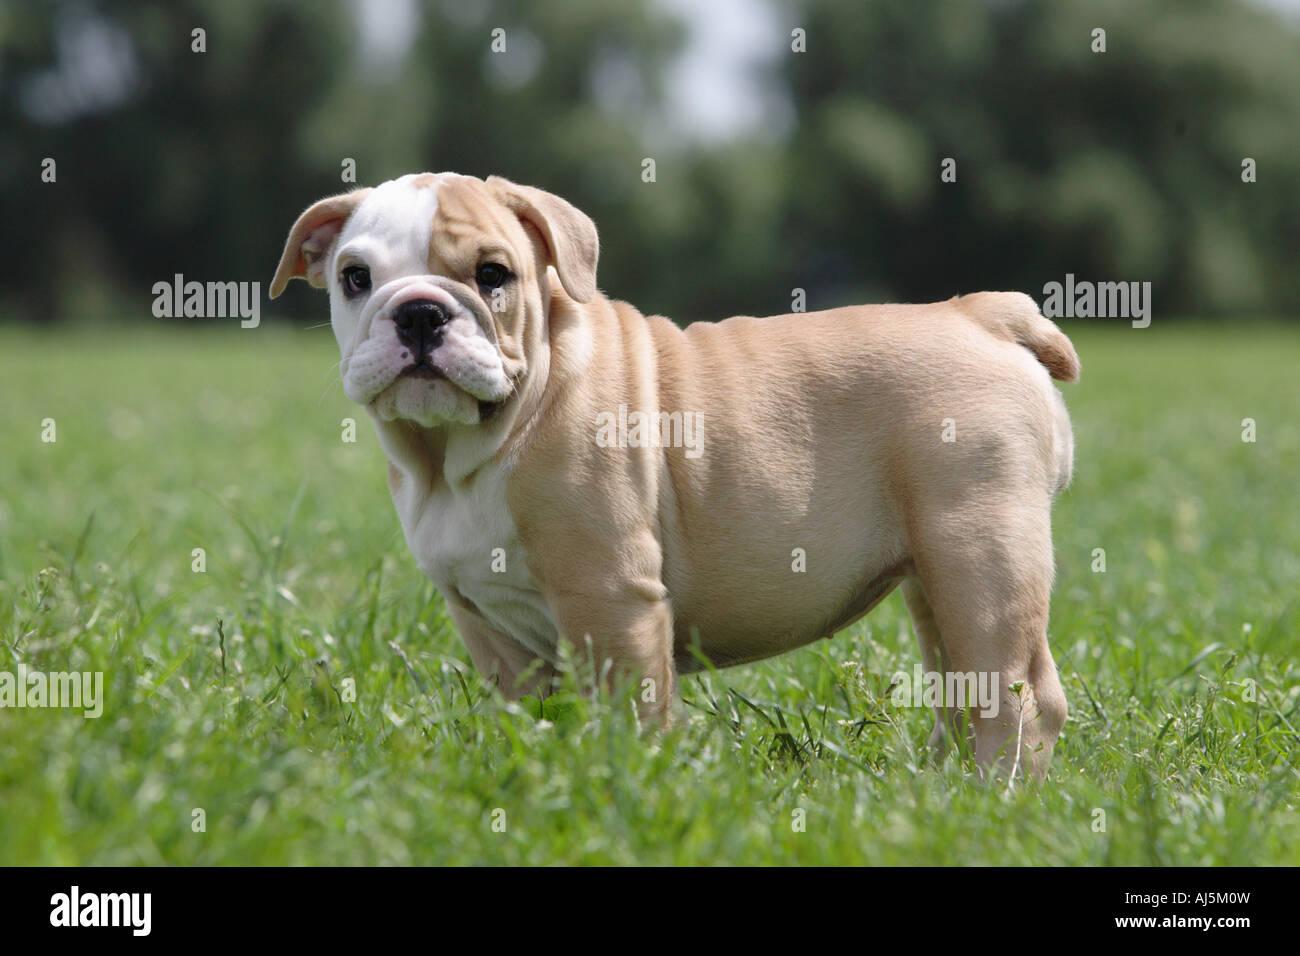 12 Week Old English Bulldog Puppy Stock Photo 14629896 Alamy